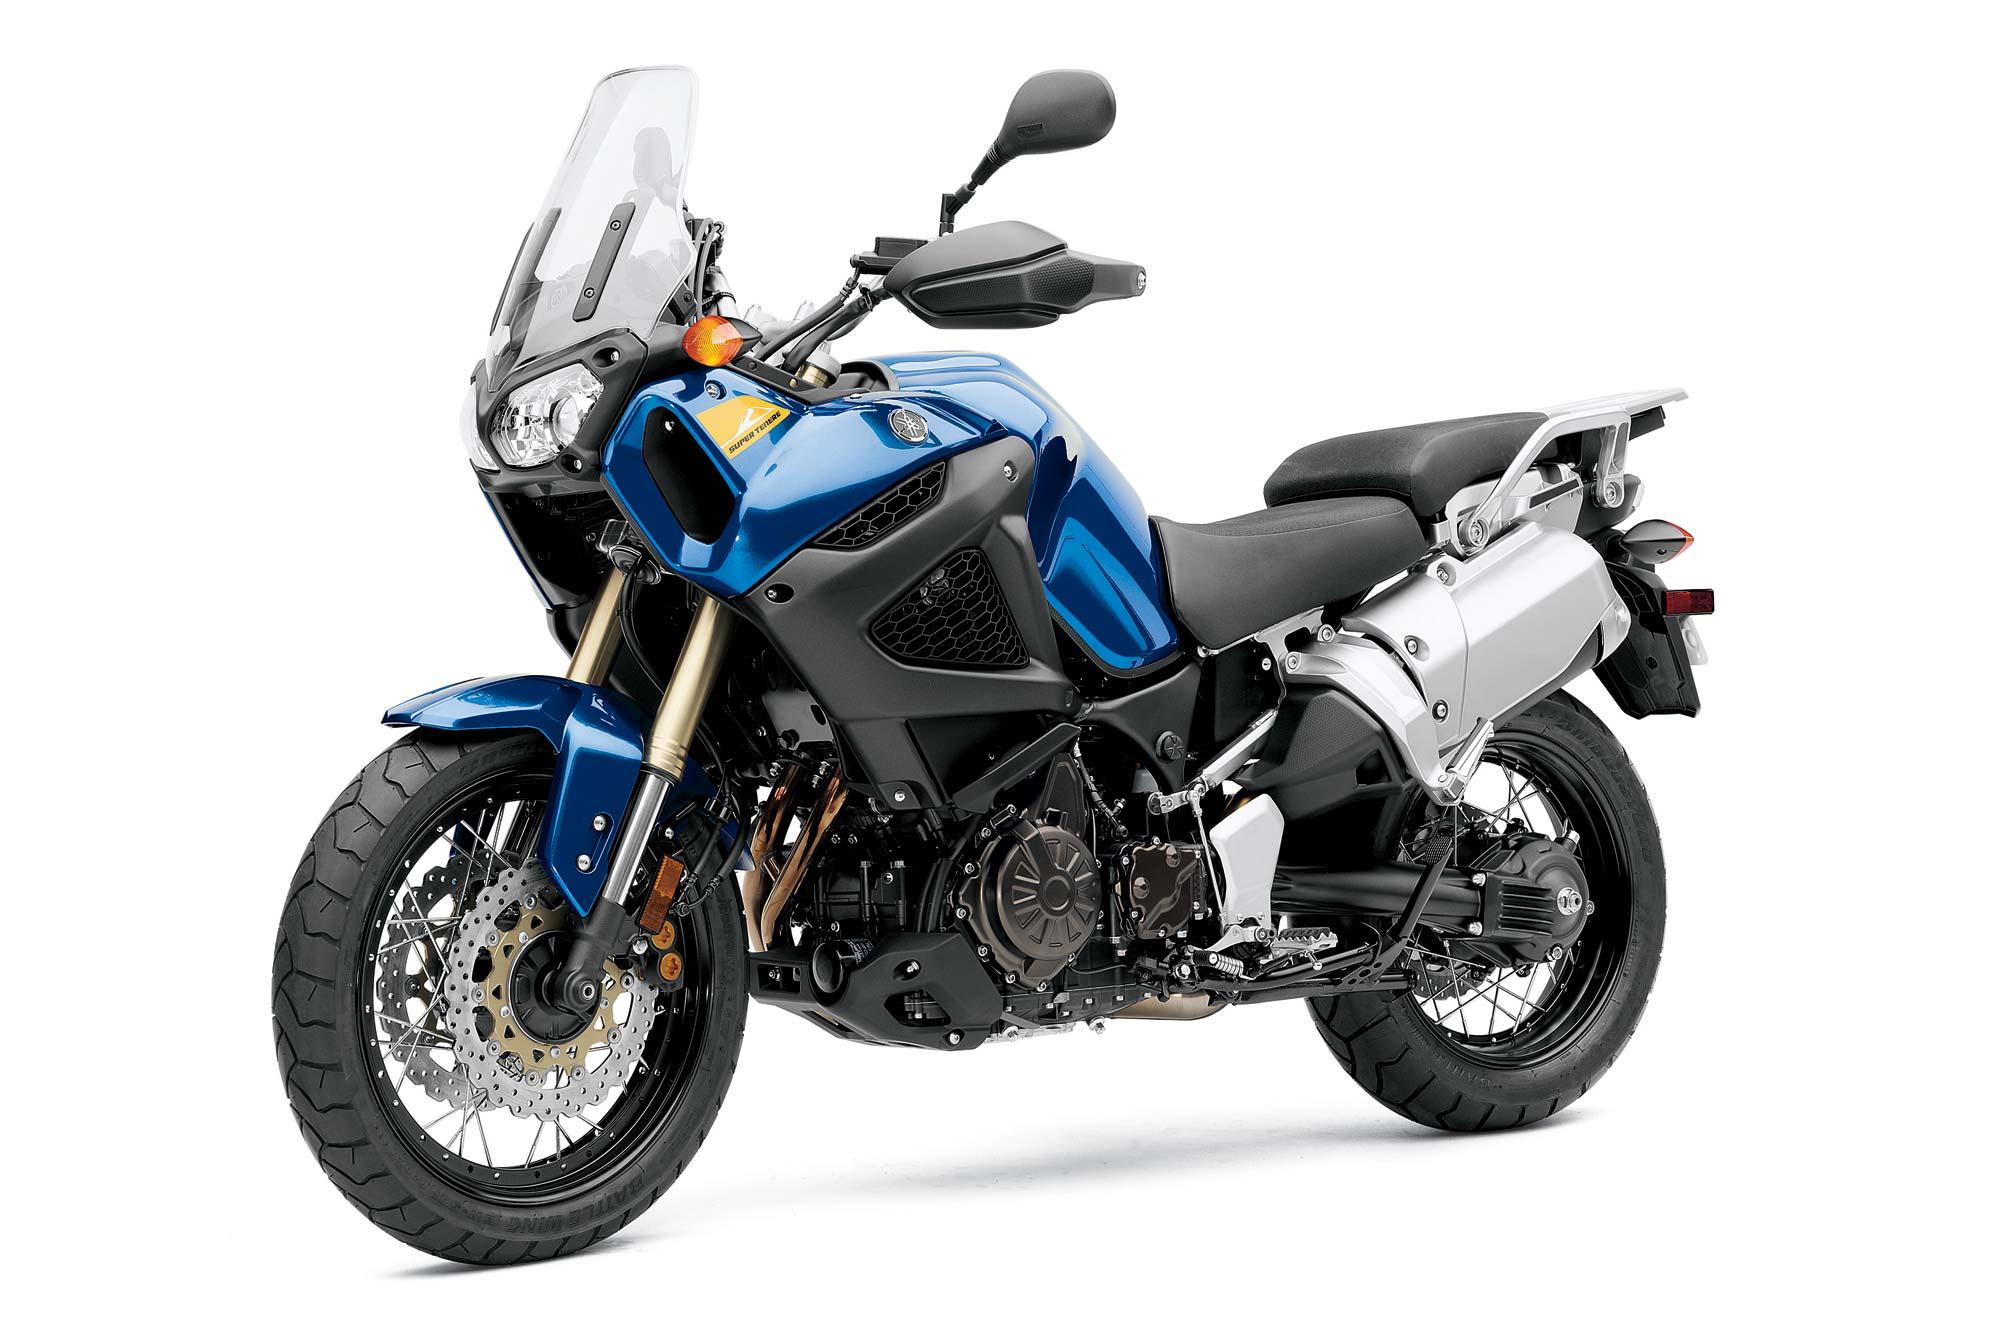 2012 Yamaha Xt1200z Super T 233 N 233 R 233 Asphalt Amp Rubber